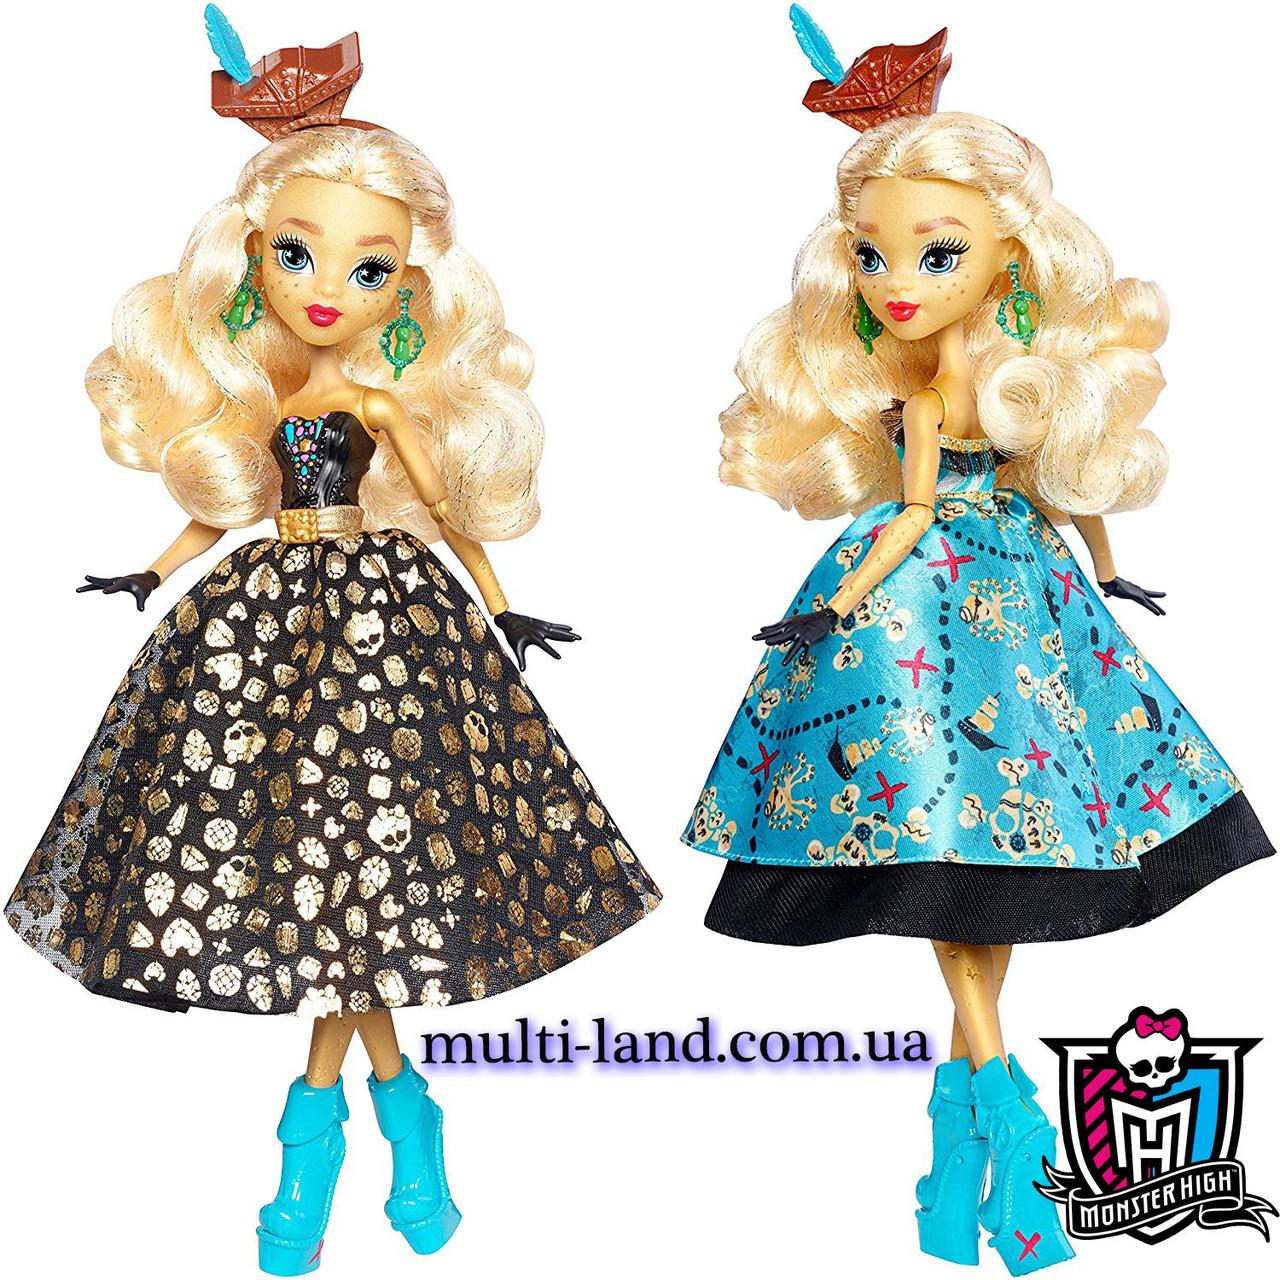 Кукла Монстр Хай Дана Трежура Джонс Кораблекрушение Monster High Shriekwrecked Dayna Treasura Jones Doll